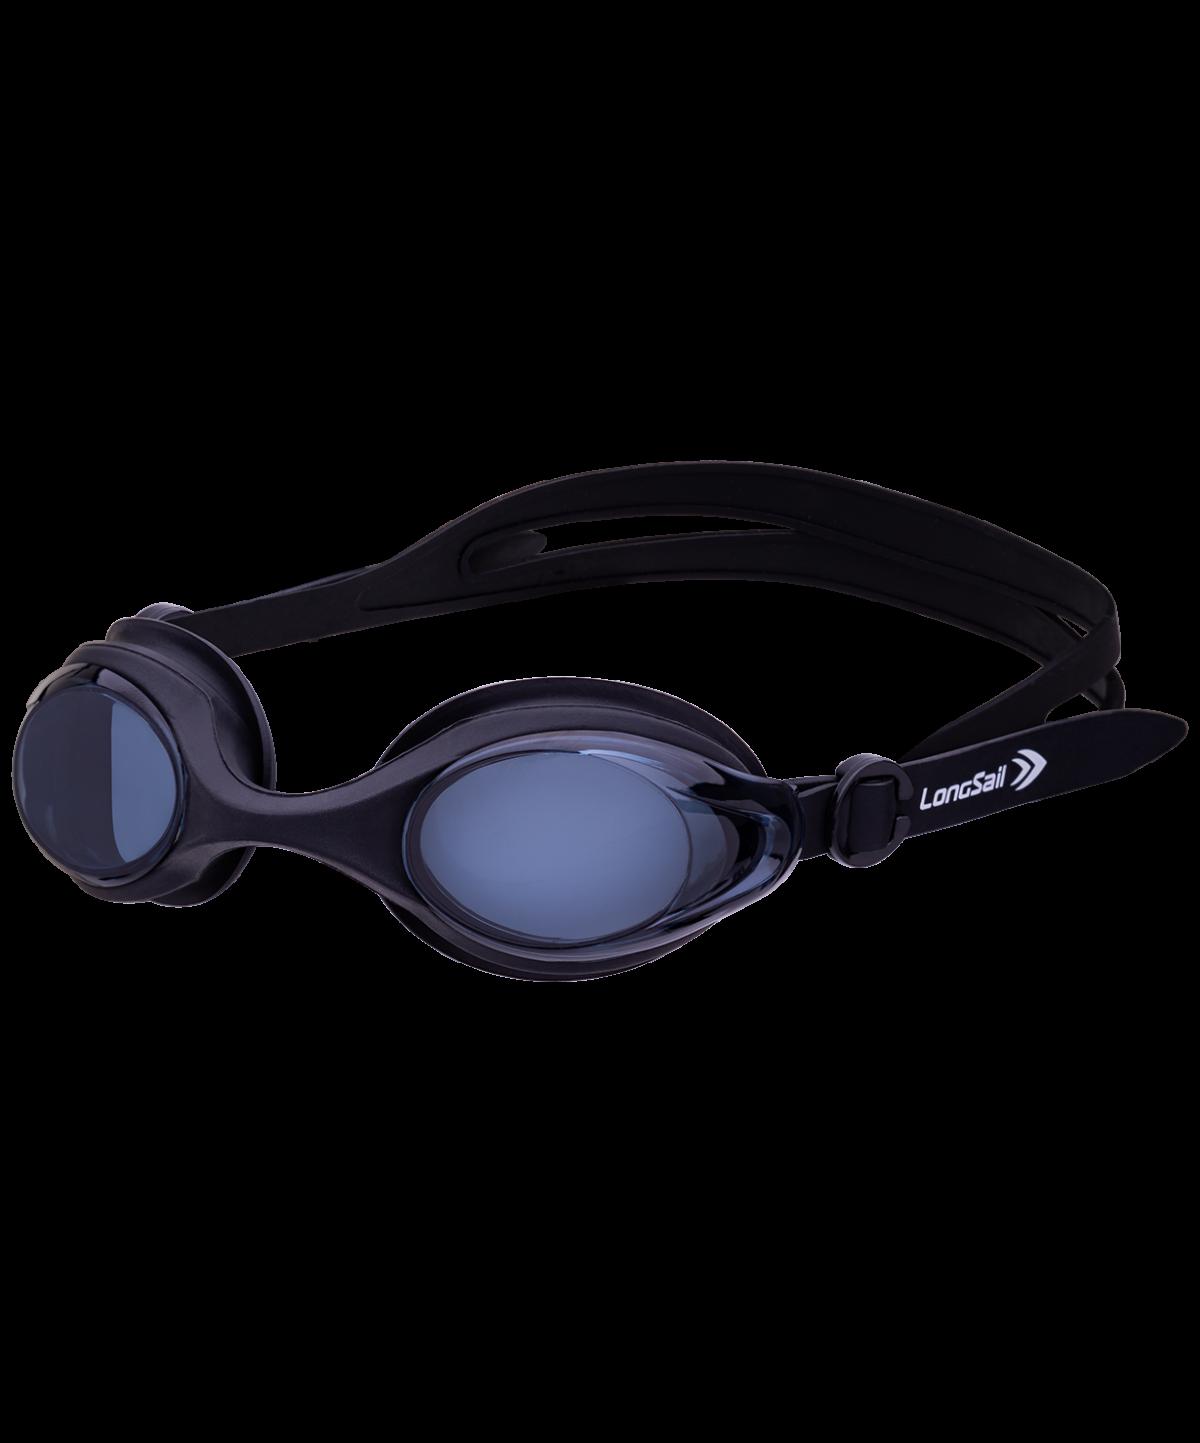 LONGSAIL Motion Очки для плавания  L041647: чёрный/серый - 1